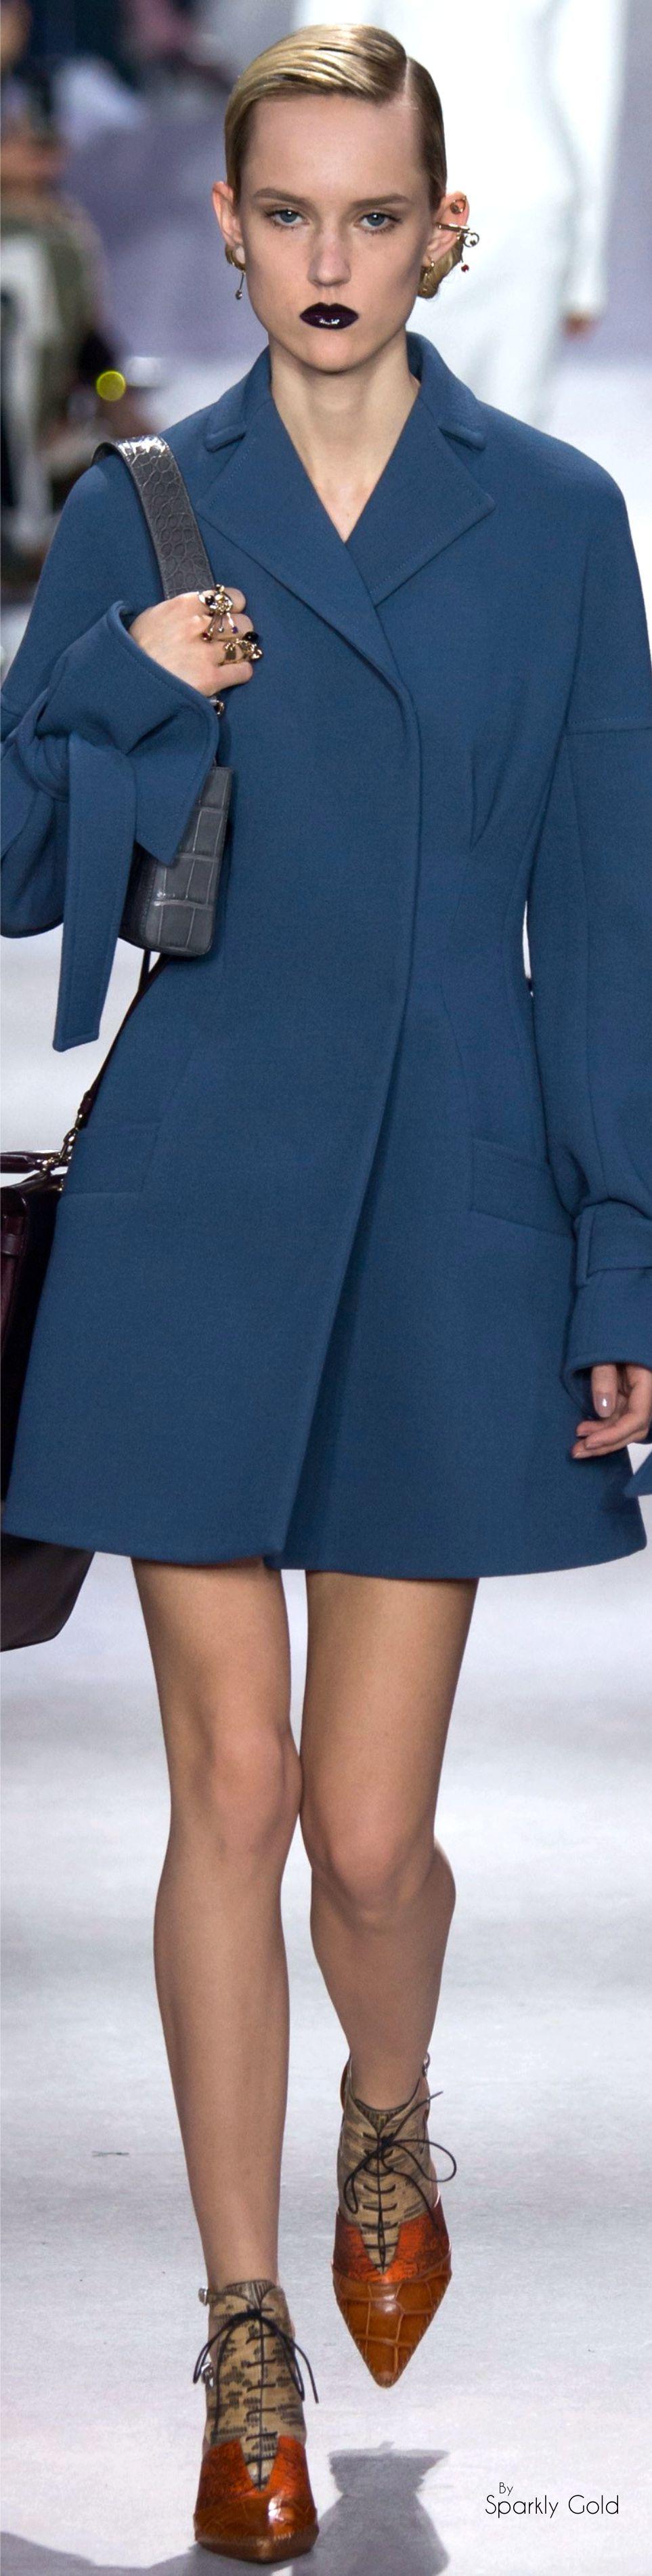 Christian Dior Fall 2016 RTW blue coat women fashion